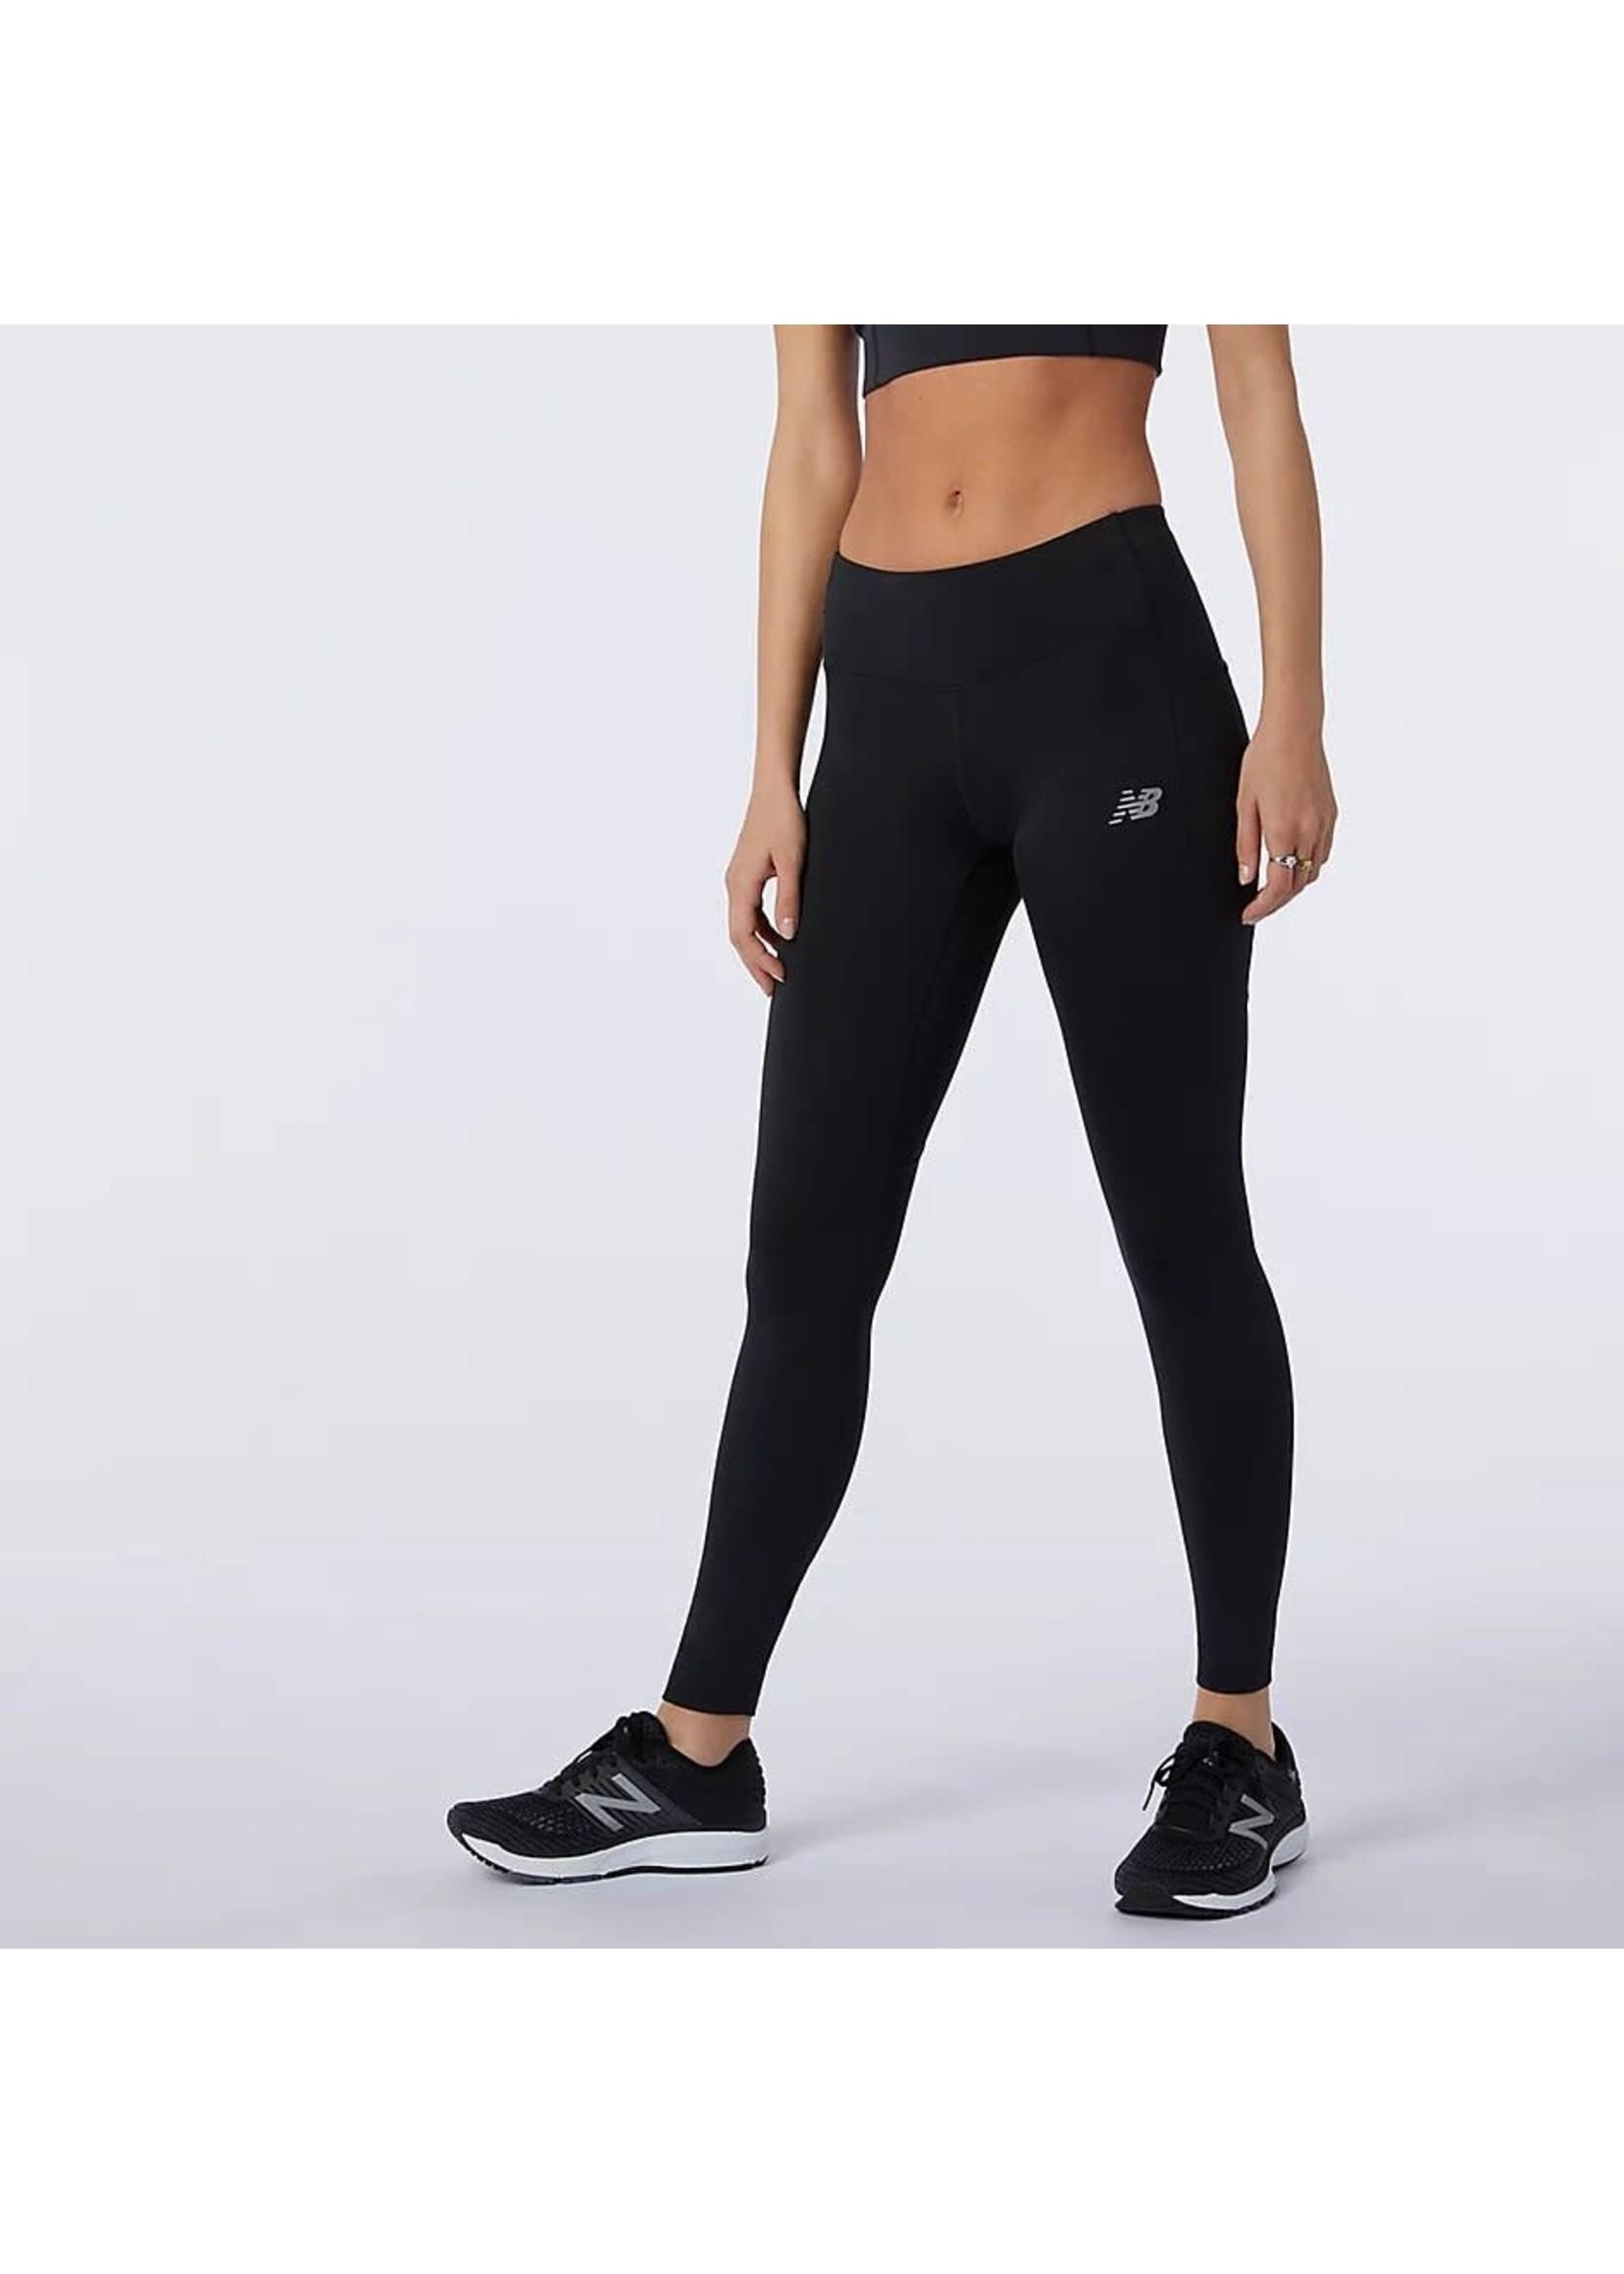 NEW BALANCE Legging Impact Run Tight